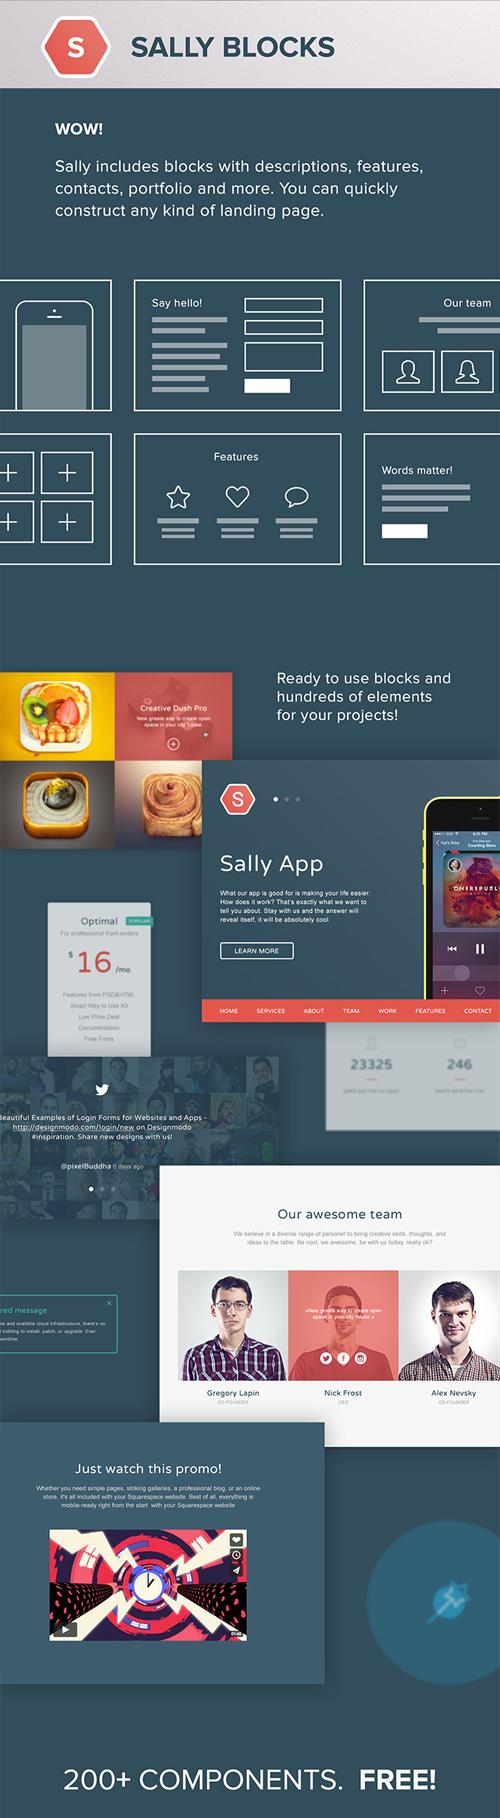 Sally Blocks UI Elements